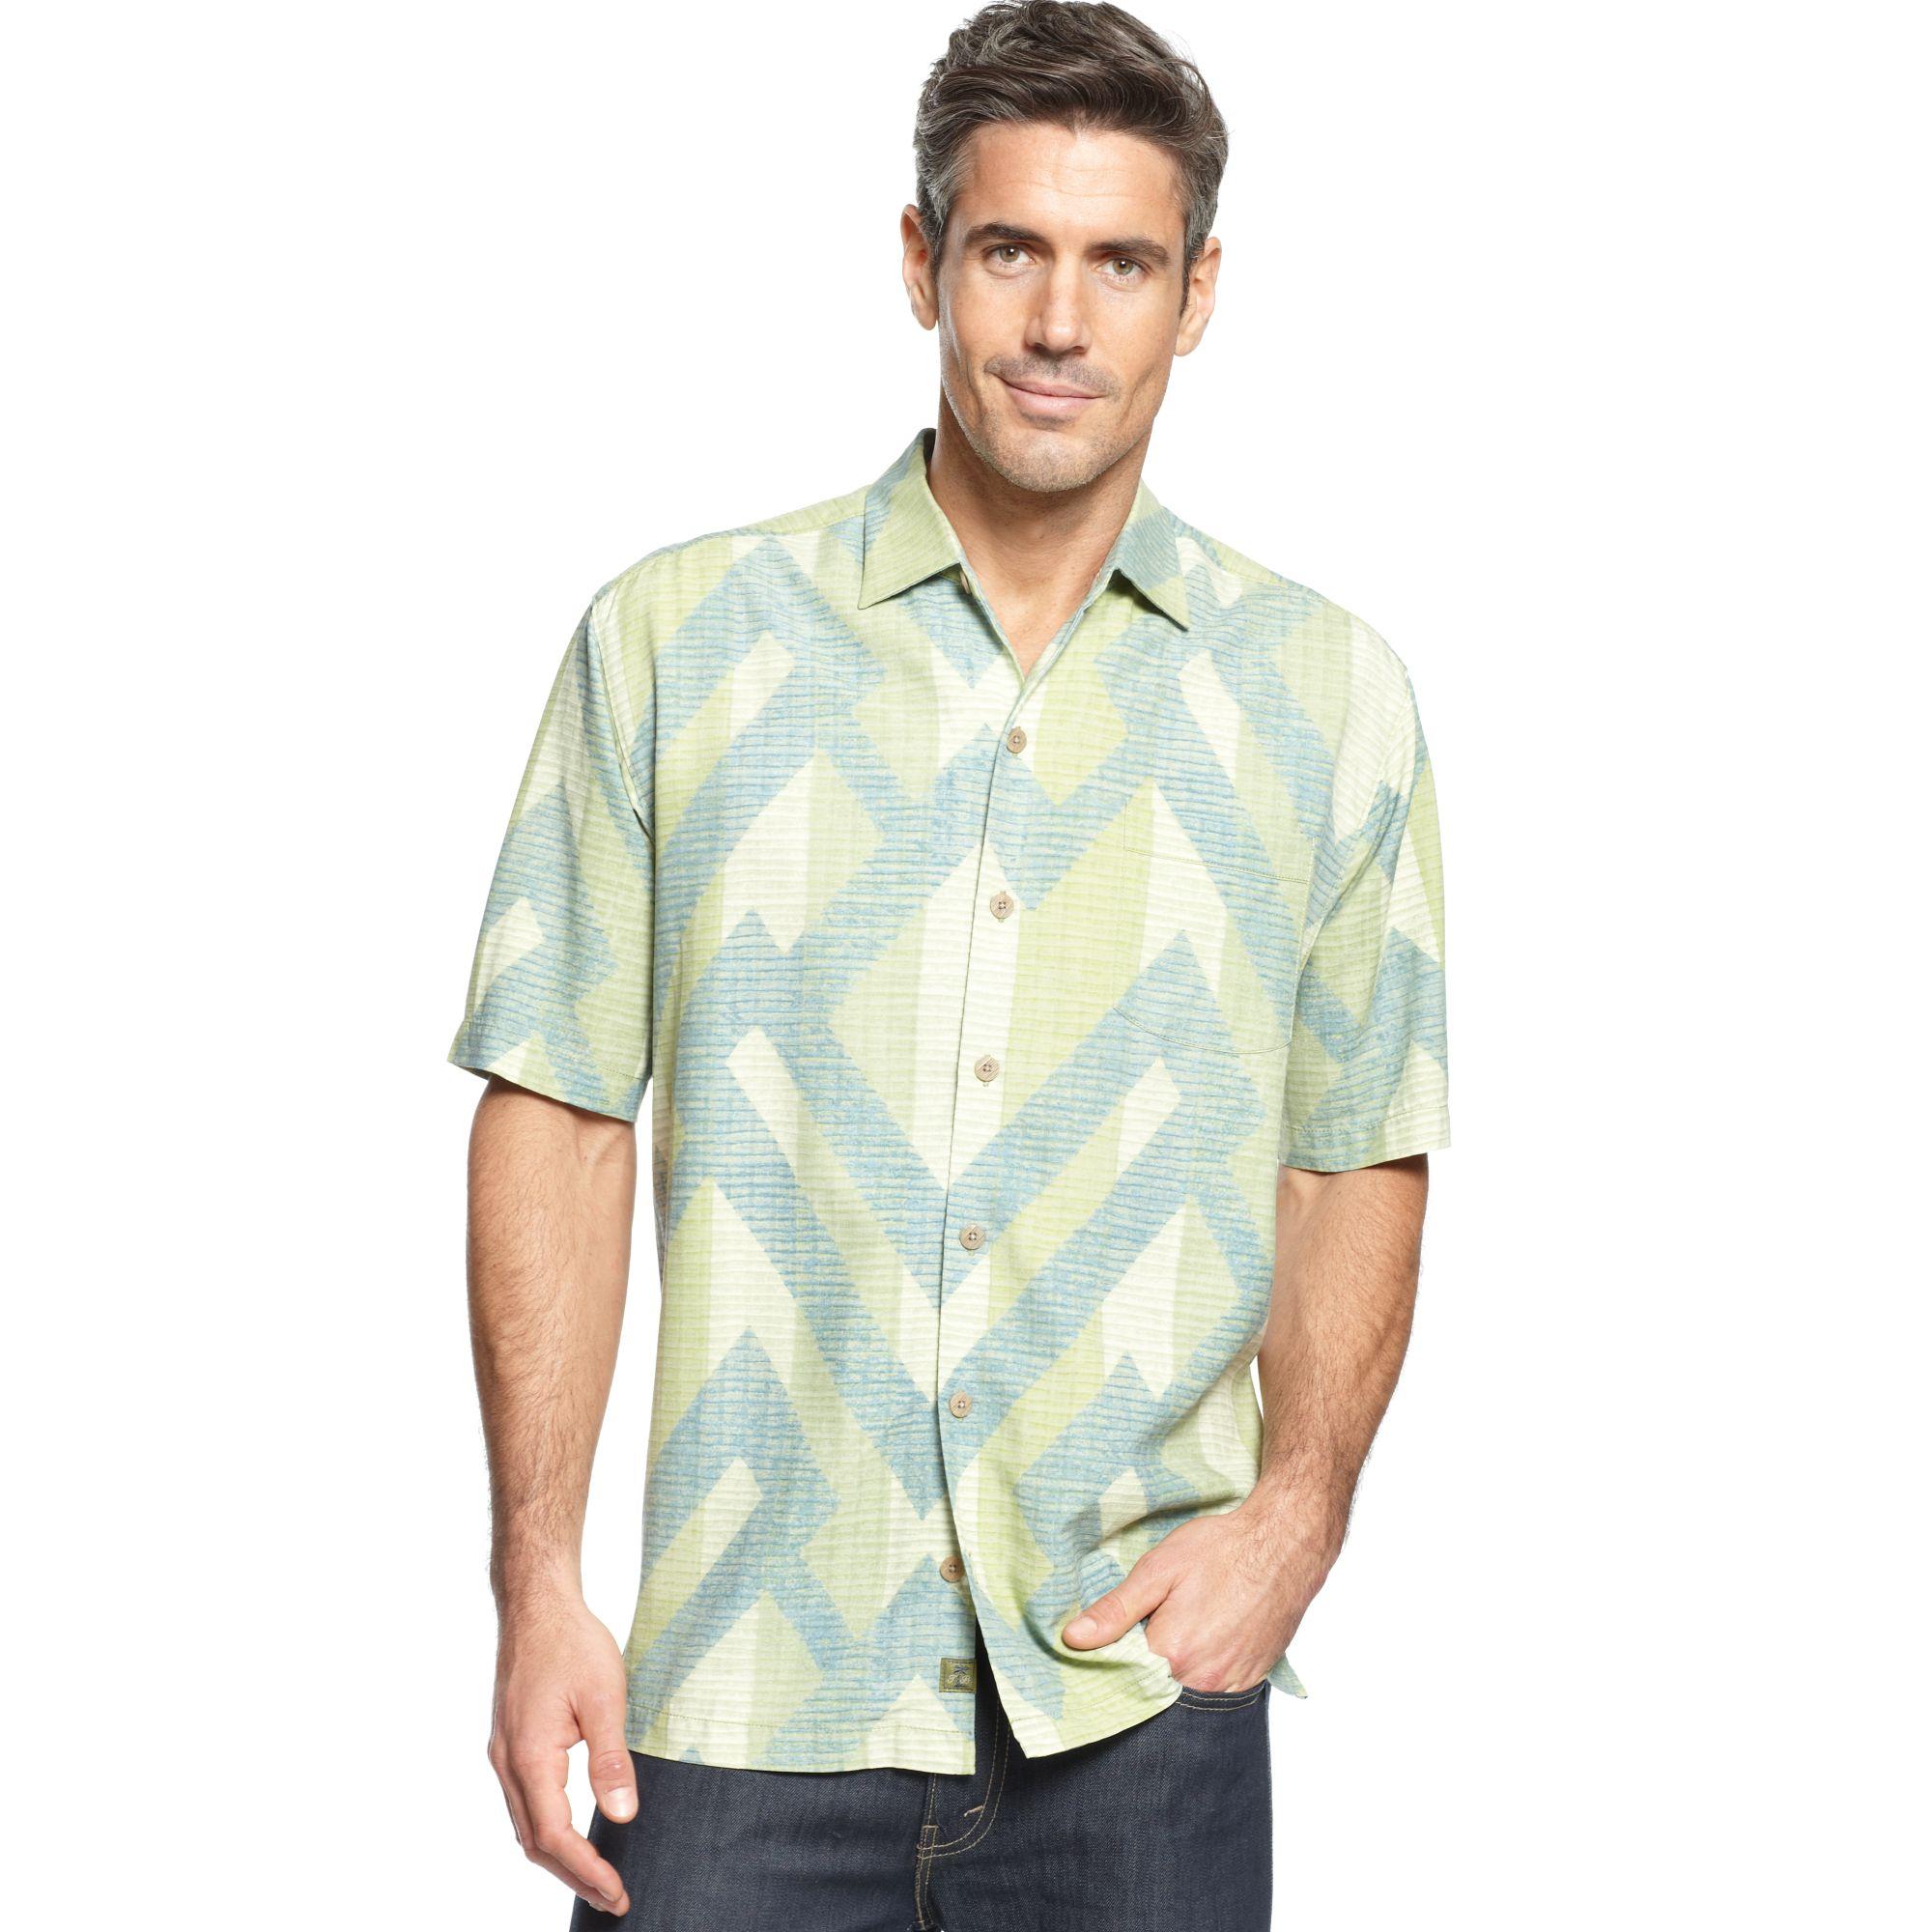 Tommy bahama ornate paradise short sleeve shirt in for Tommy bahama christmas shirt 2014